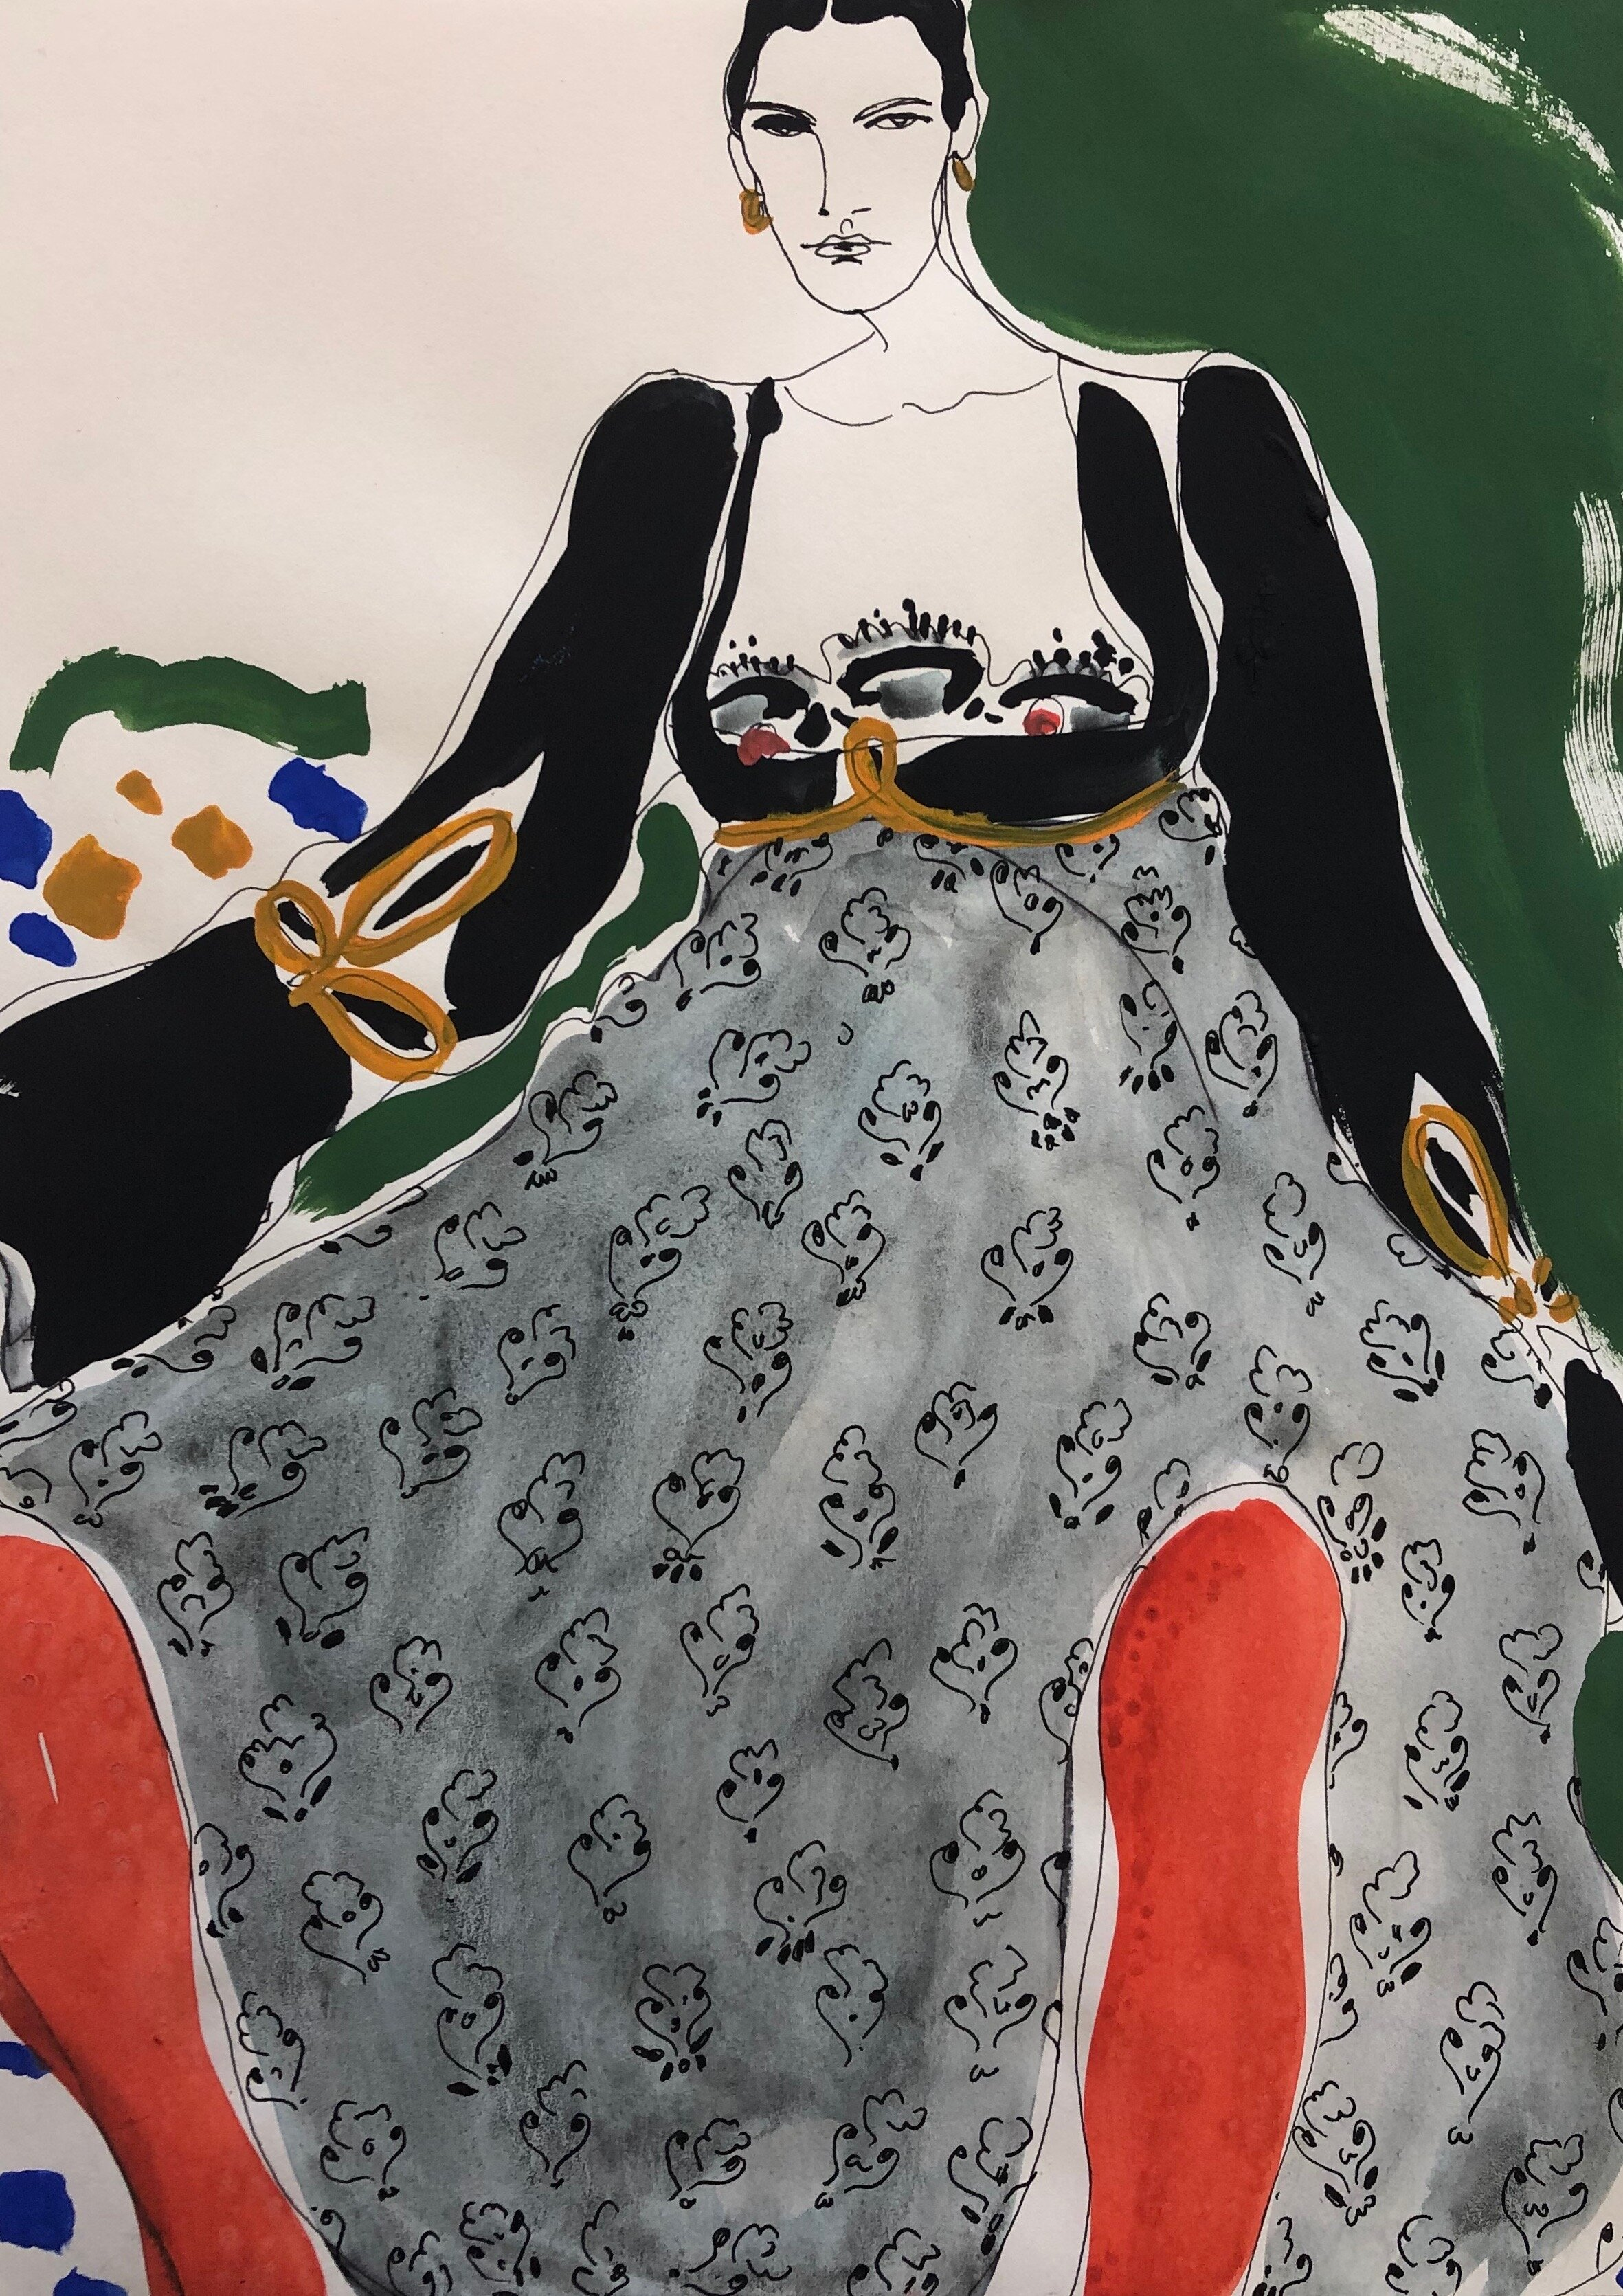 Rosie McGuinness - Banshee III, 2019Pen and gouache on paper19 x 27.5 cmEstimate: £500-700Starting bid: £350